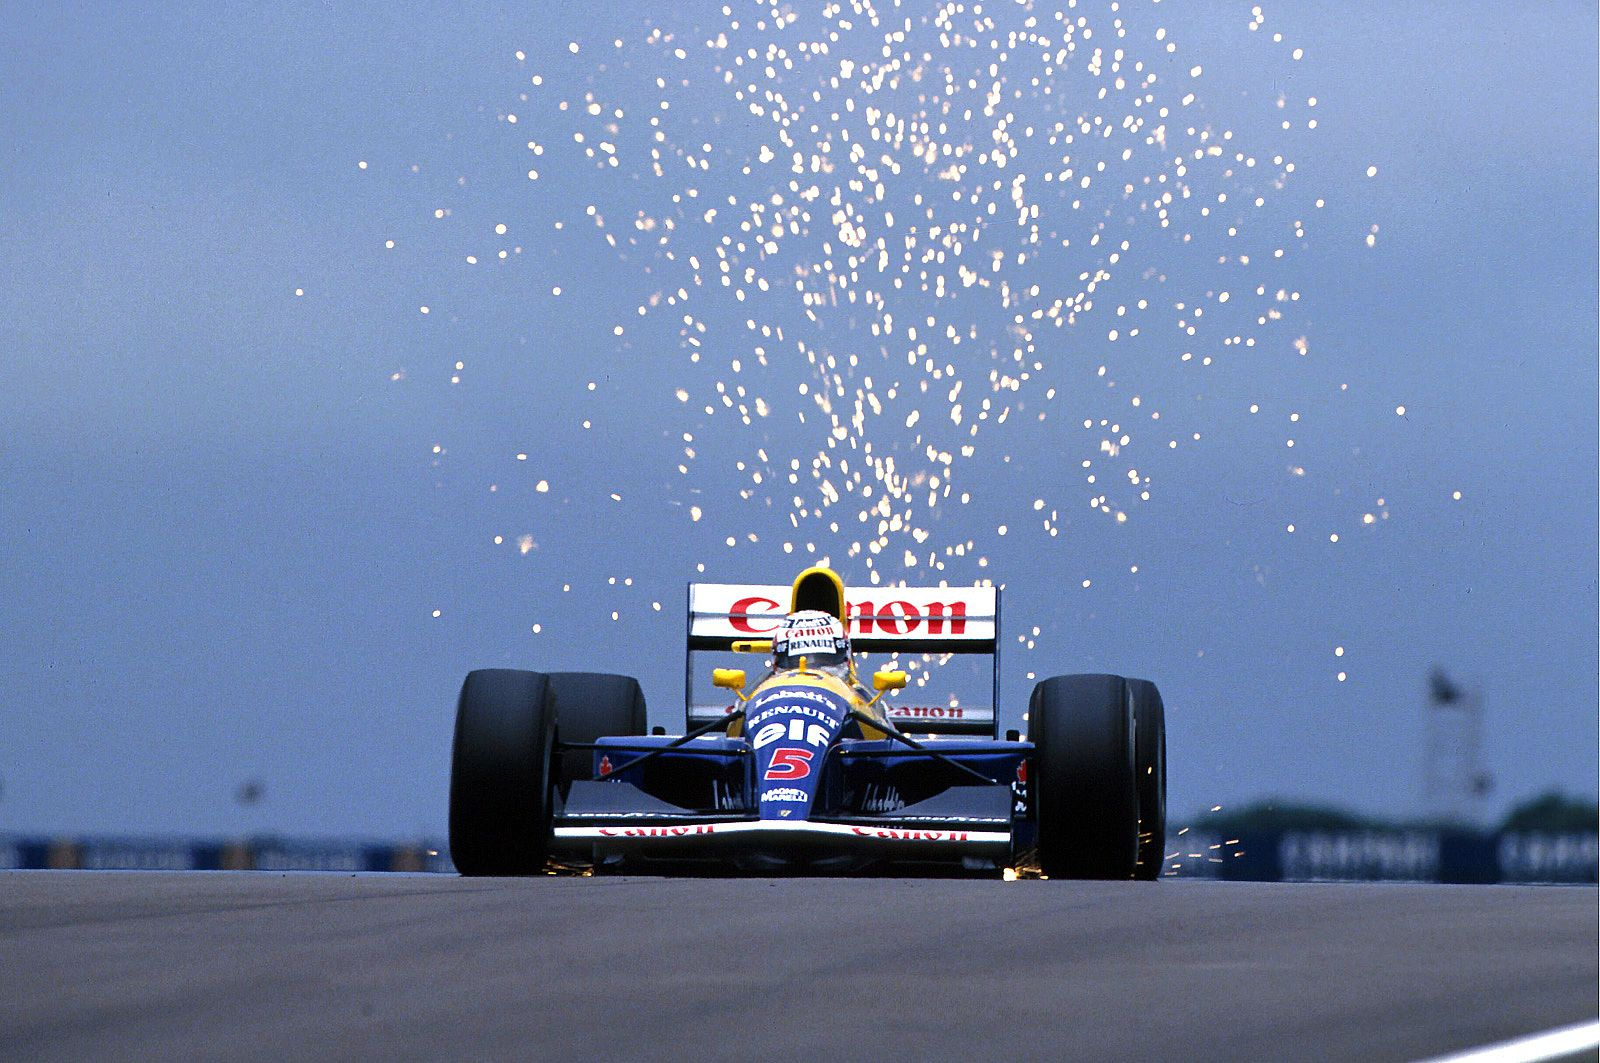 Nigel-Mansell-on-his-way-to-win-the-1991-British-Grand-Prix-Williams-FW14.jpg